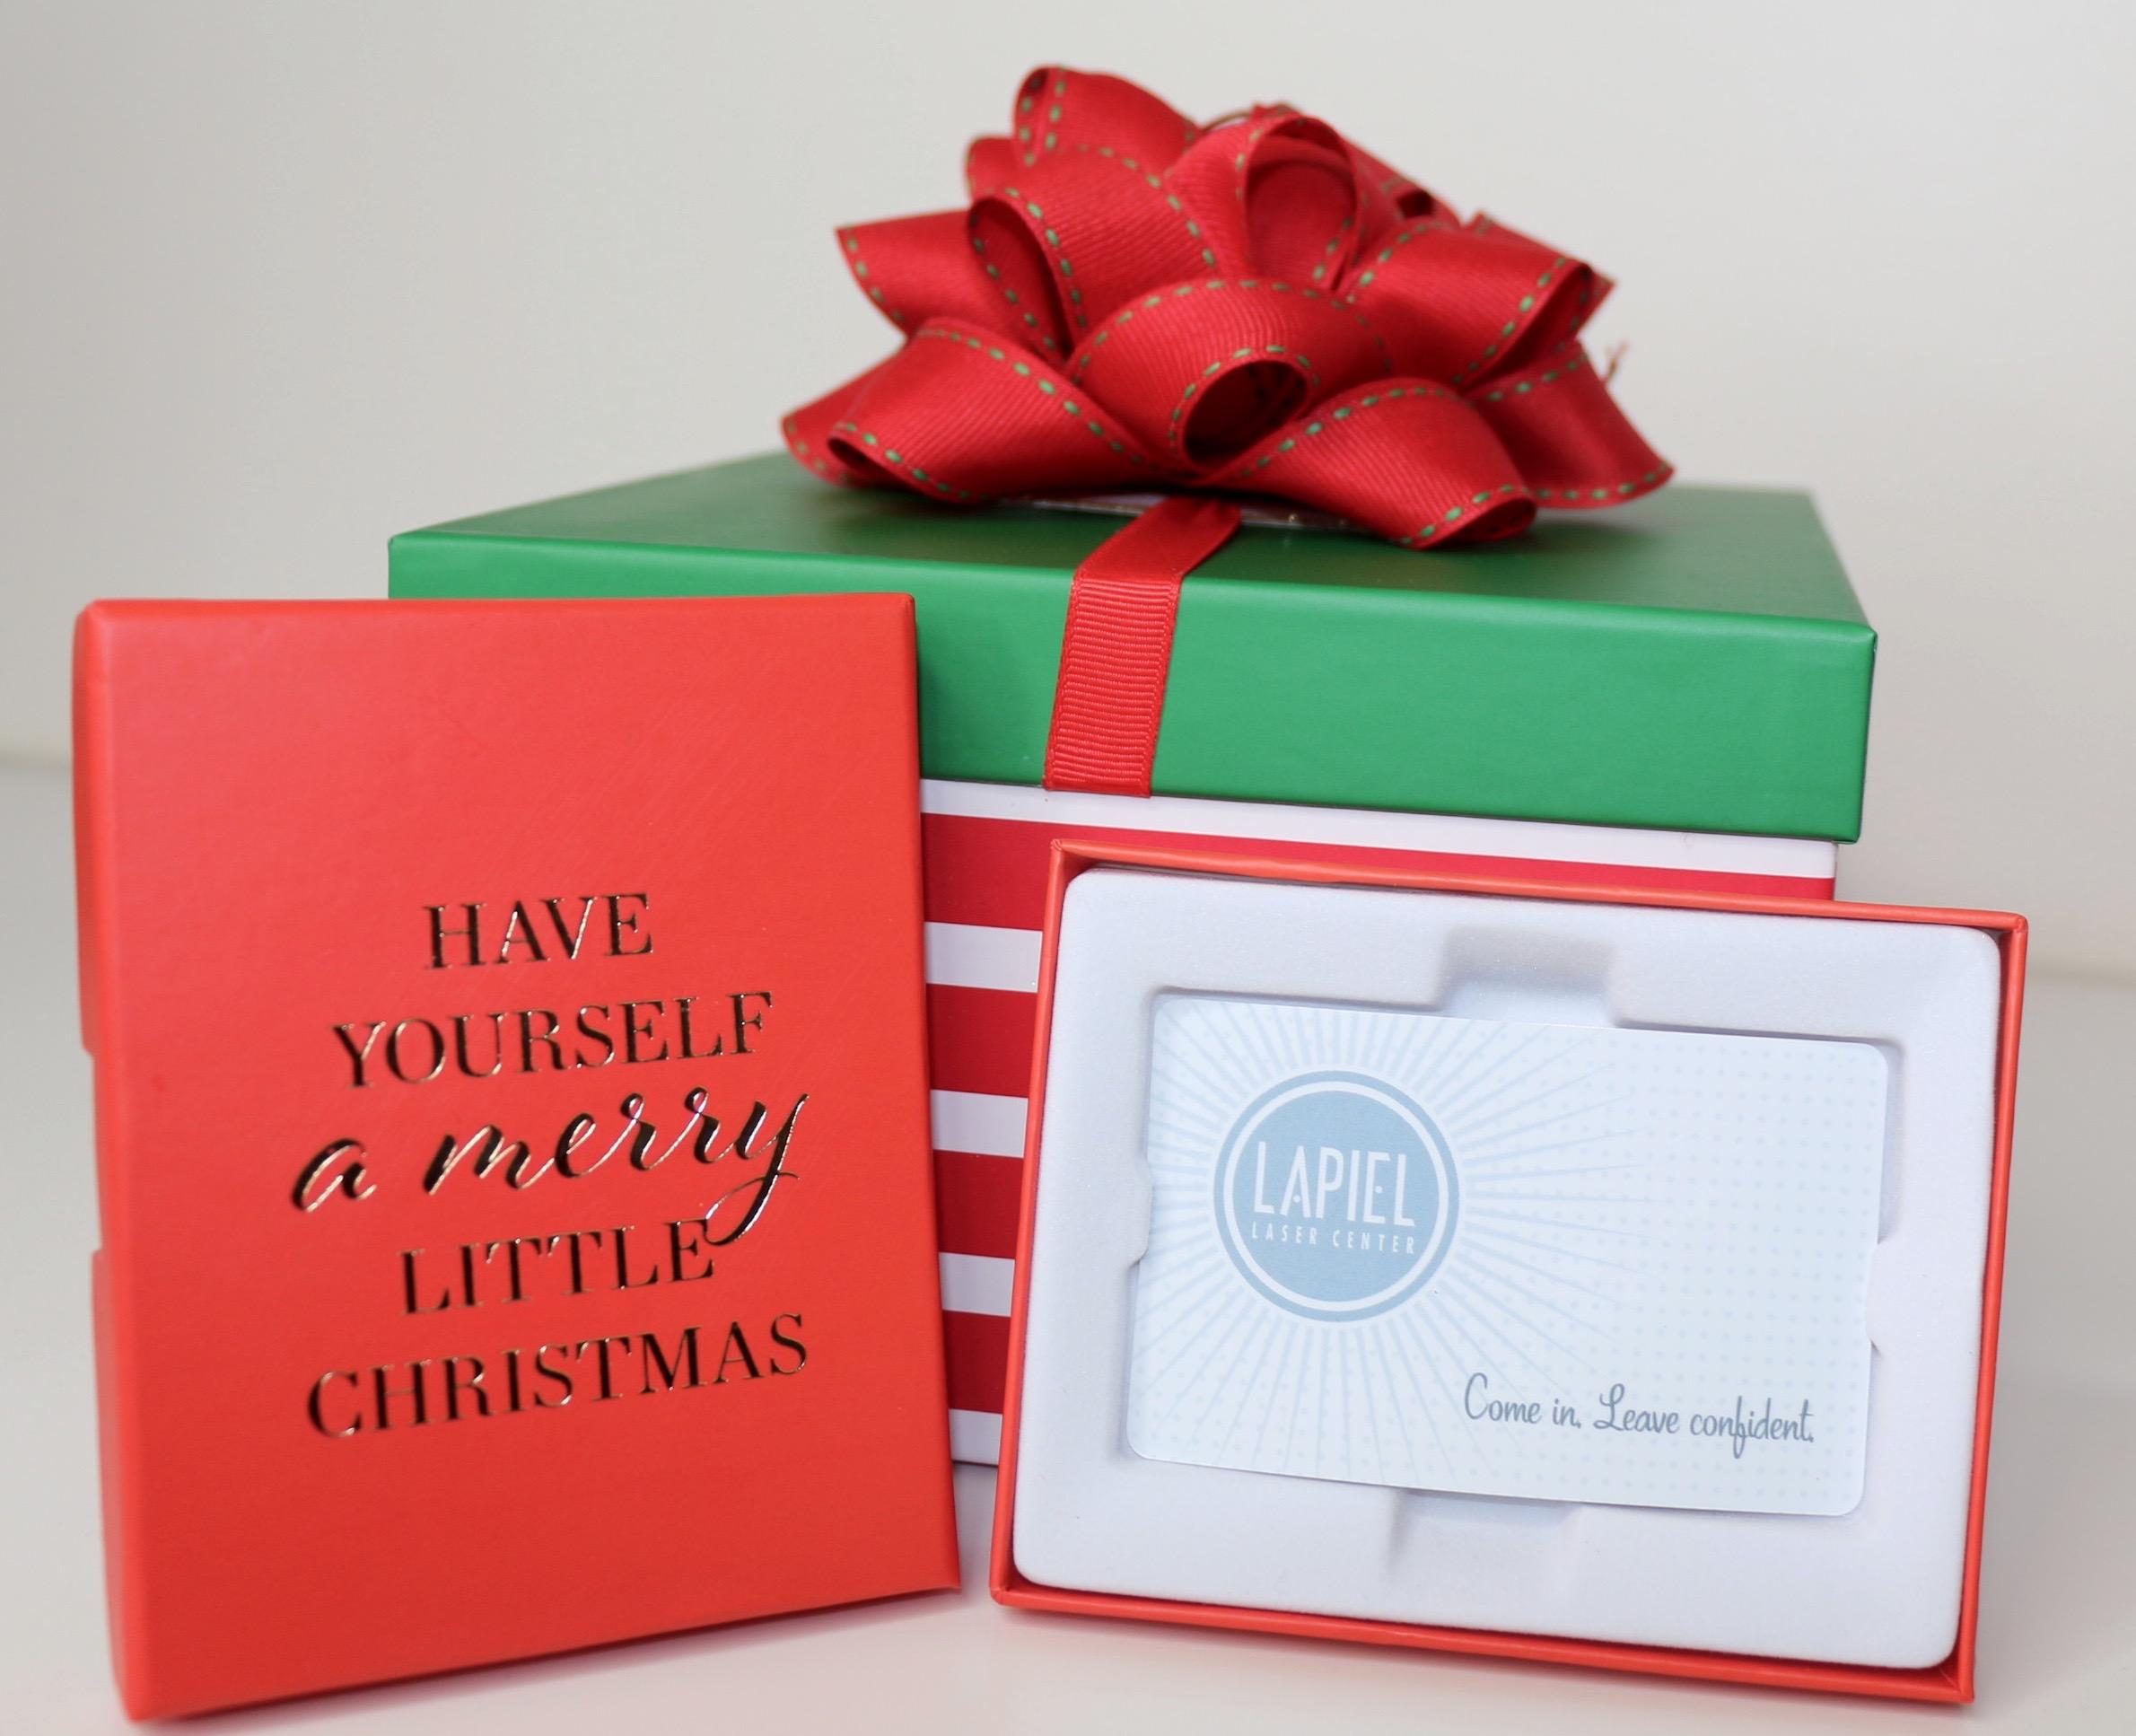 Lapiel Laser Center Gift Card